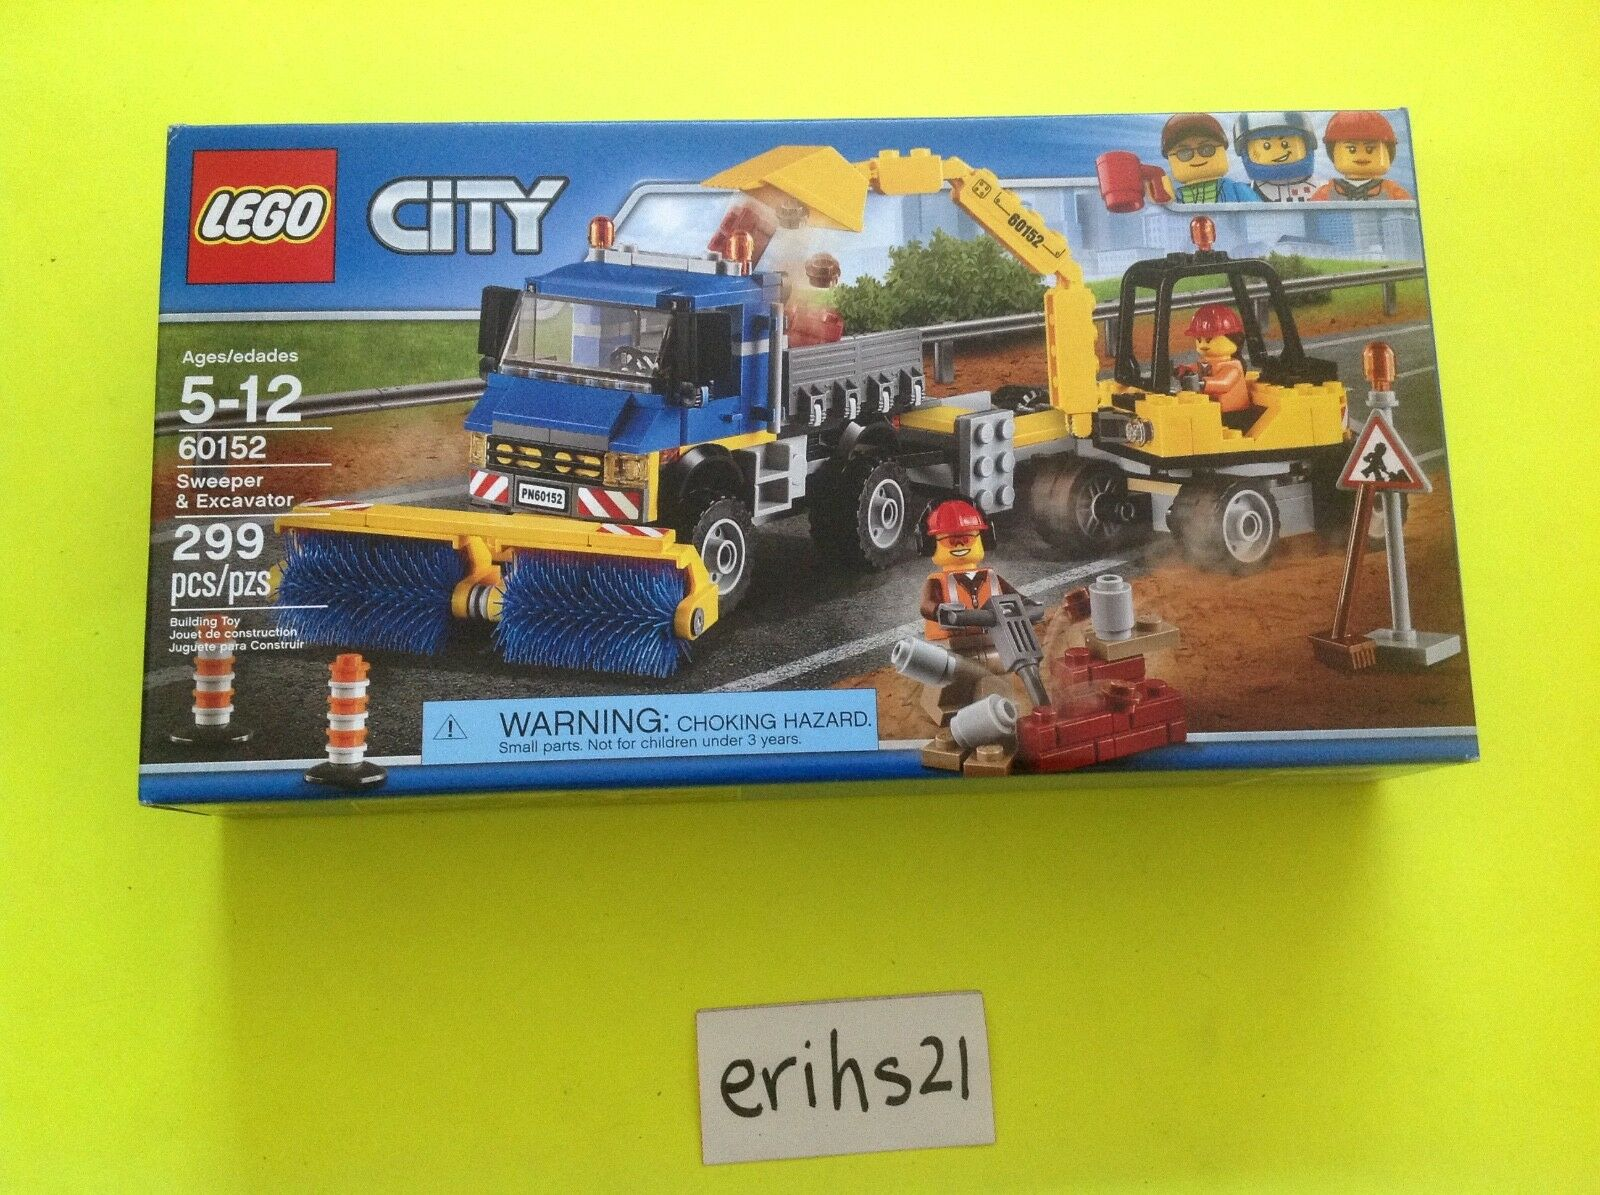 Chantier Construction New Lego Pelle De Set Balai Sealed Brand Et v8Onwm0N